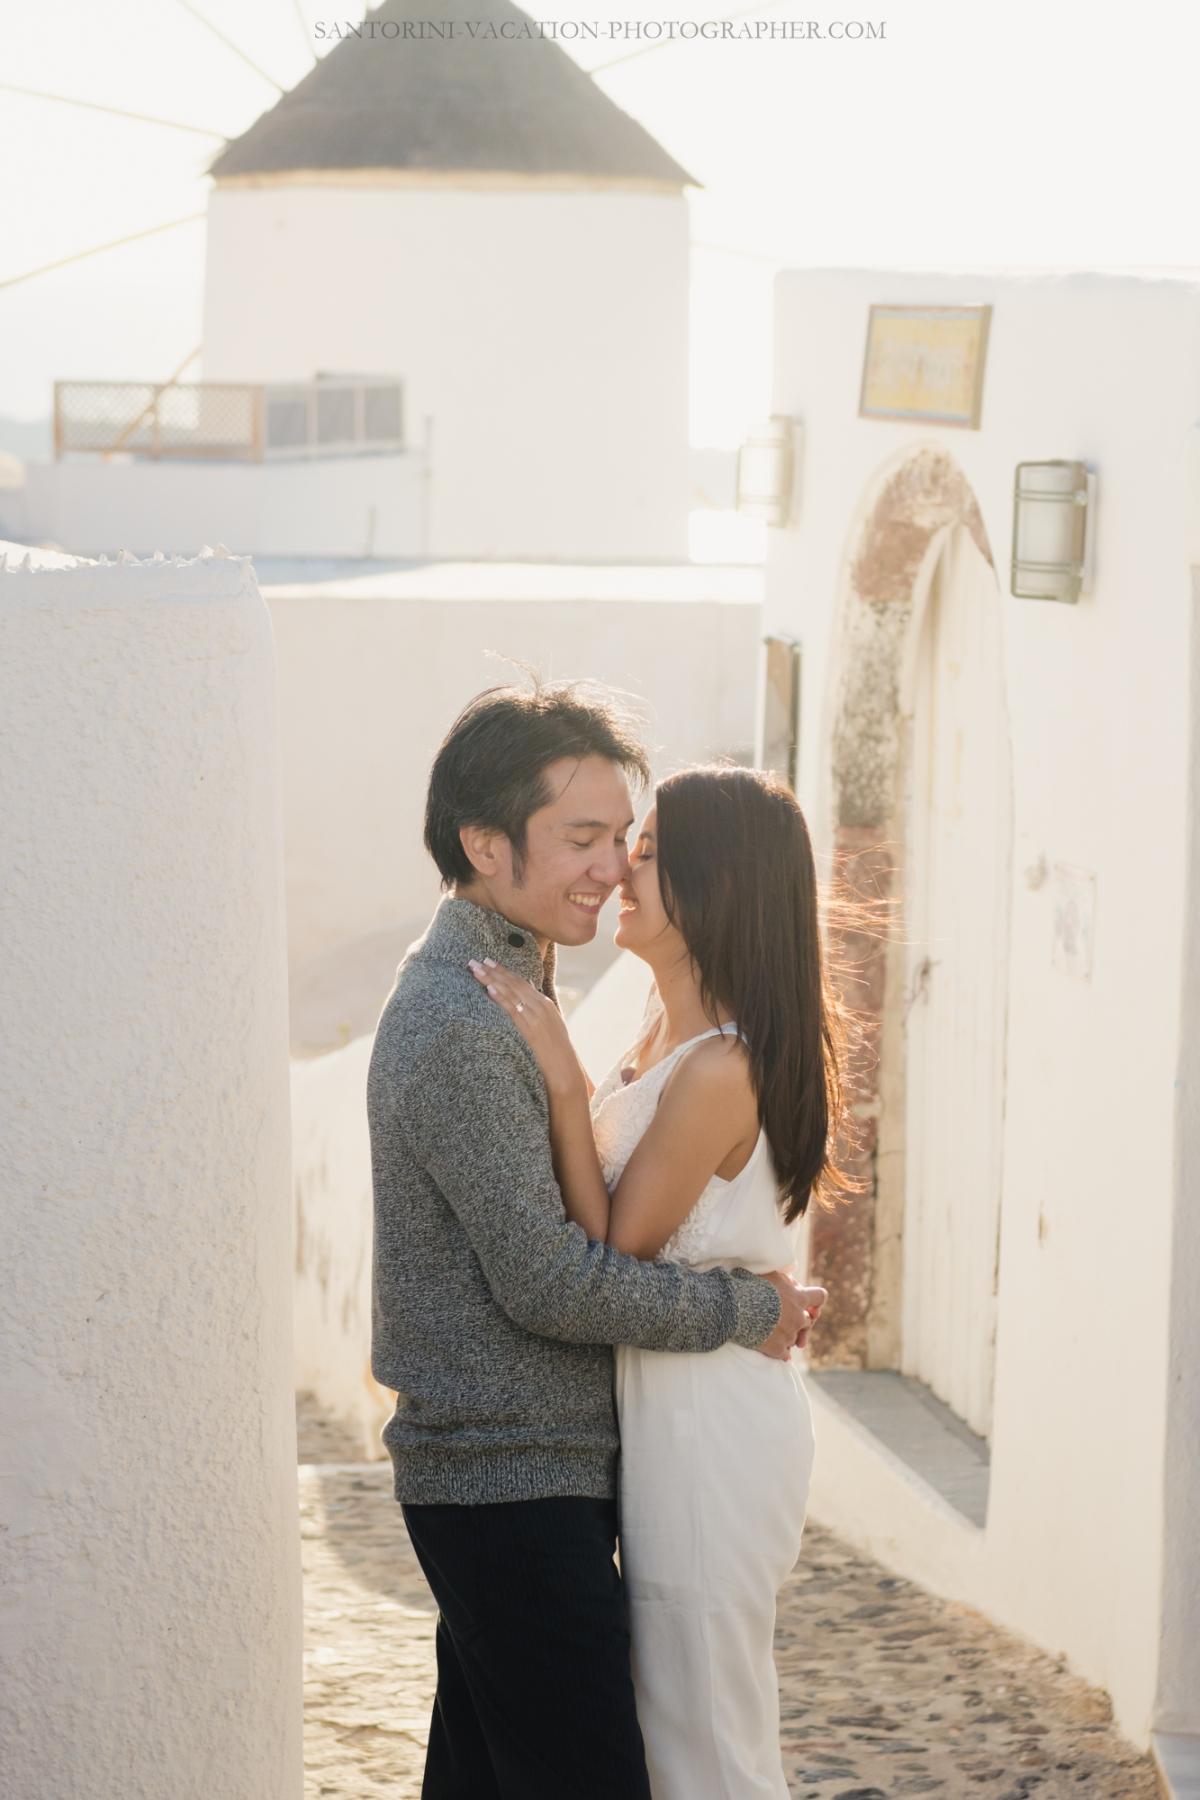 Santorini-photo-session-lifestyle-portrait-romantic-walk-oia-002